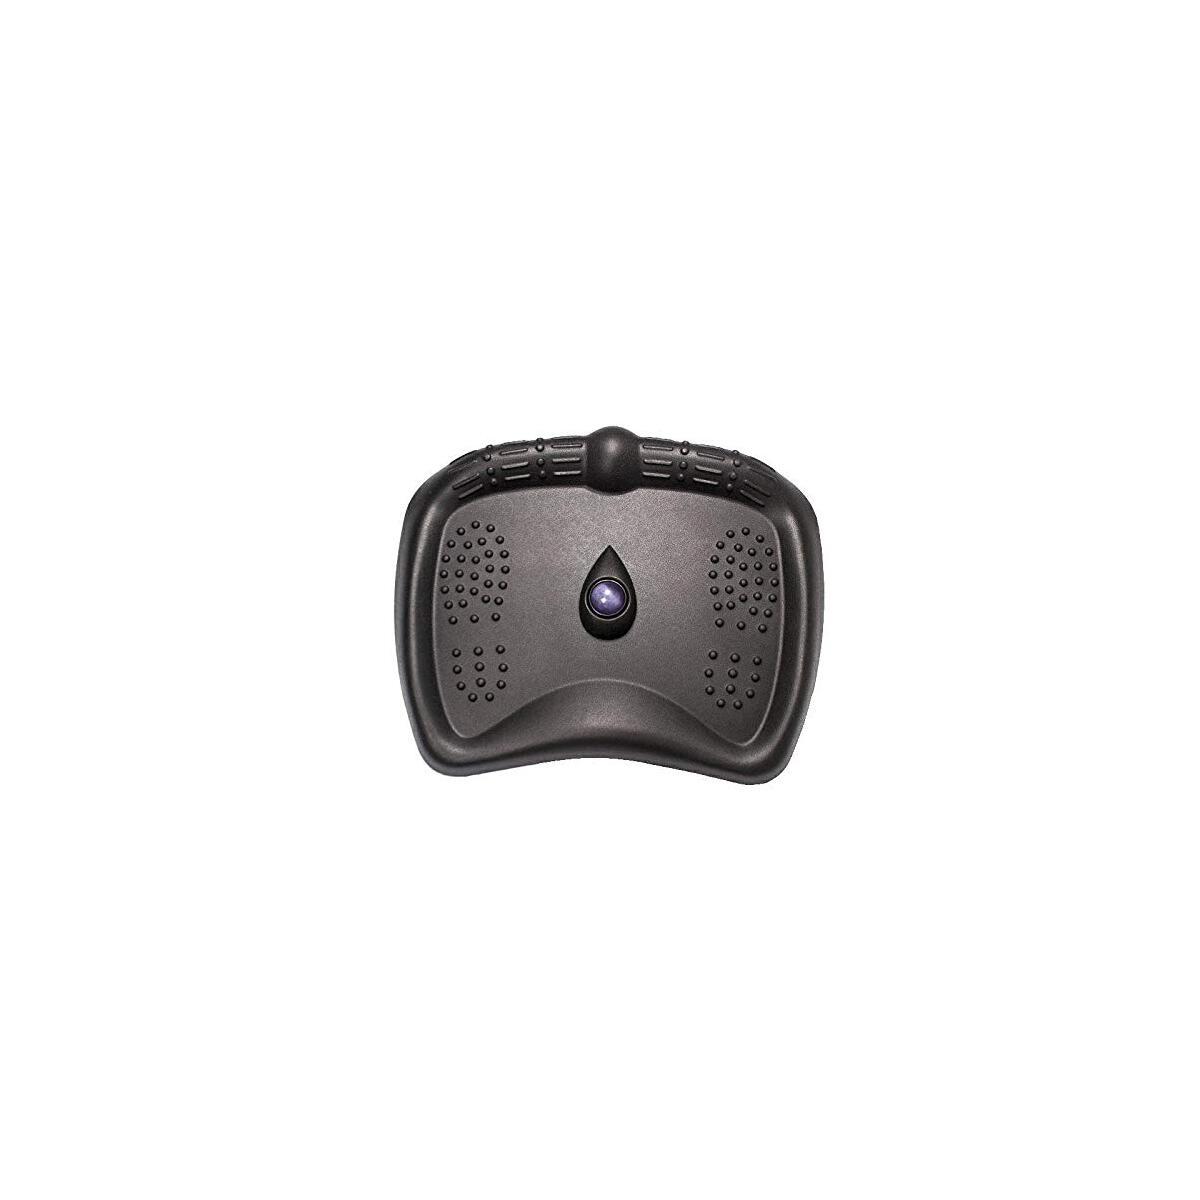 2020 Premium Anti-Fatigue Comfort Mat with Massage Ball (BK-02 green & purple only)